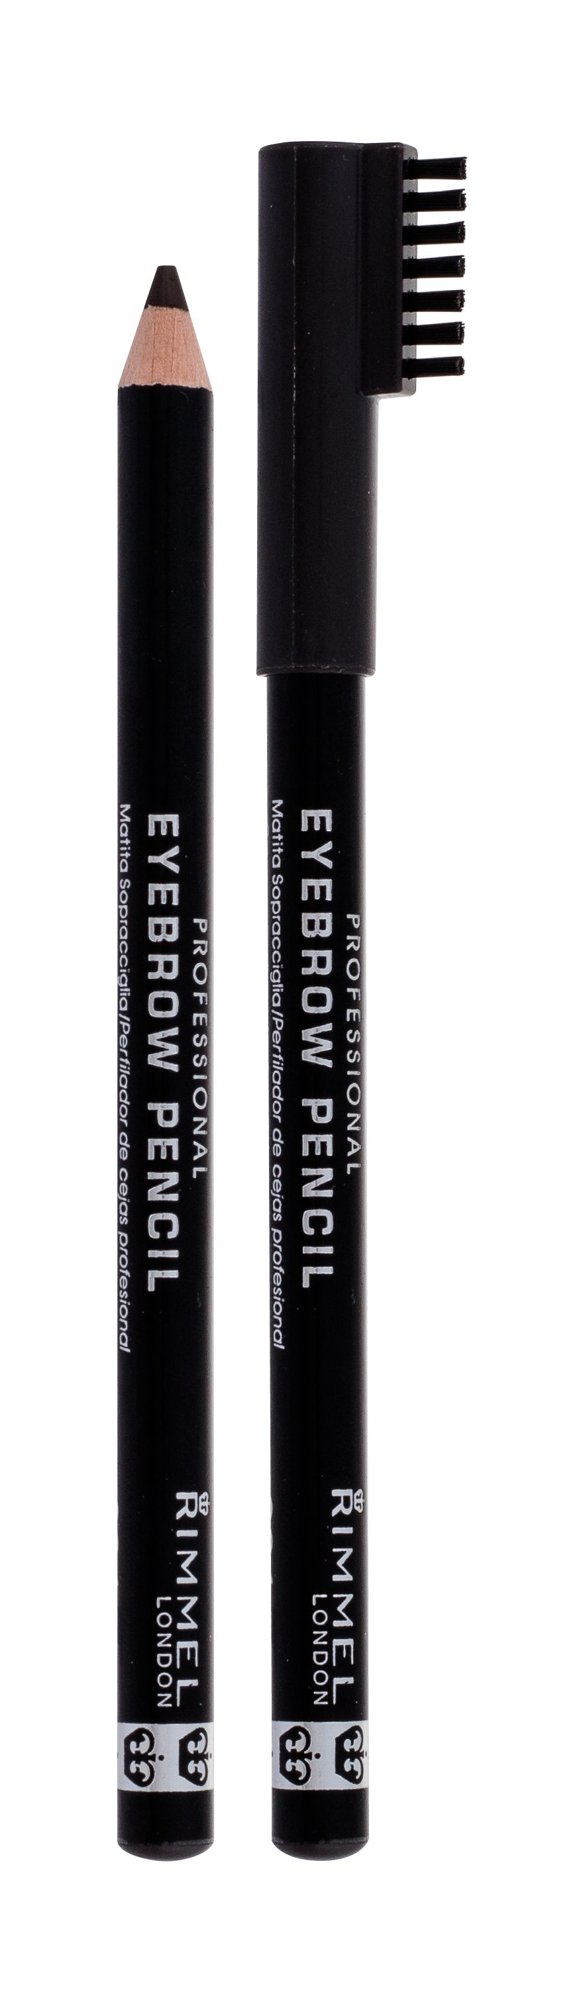 Rimmel London Professional Eyebrow Pencil Eyebrow Pencil 1,4ml 004 Black Brown